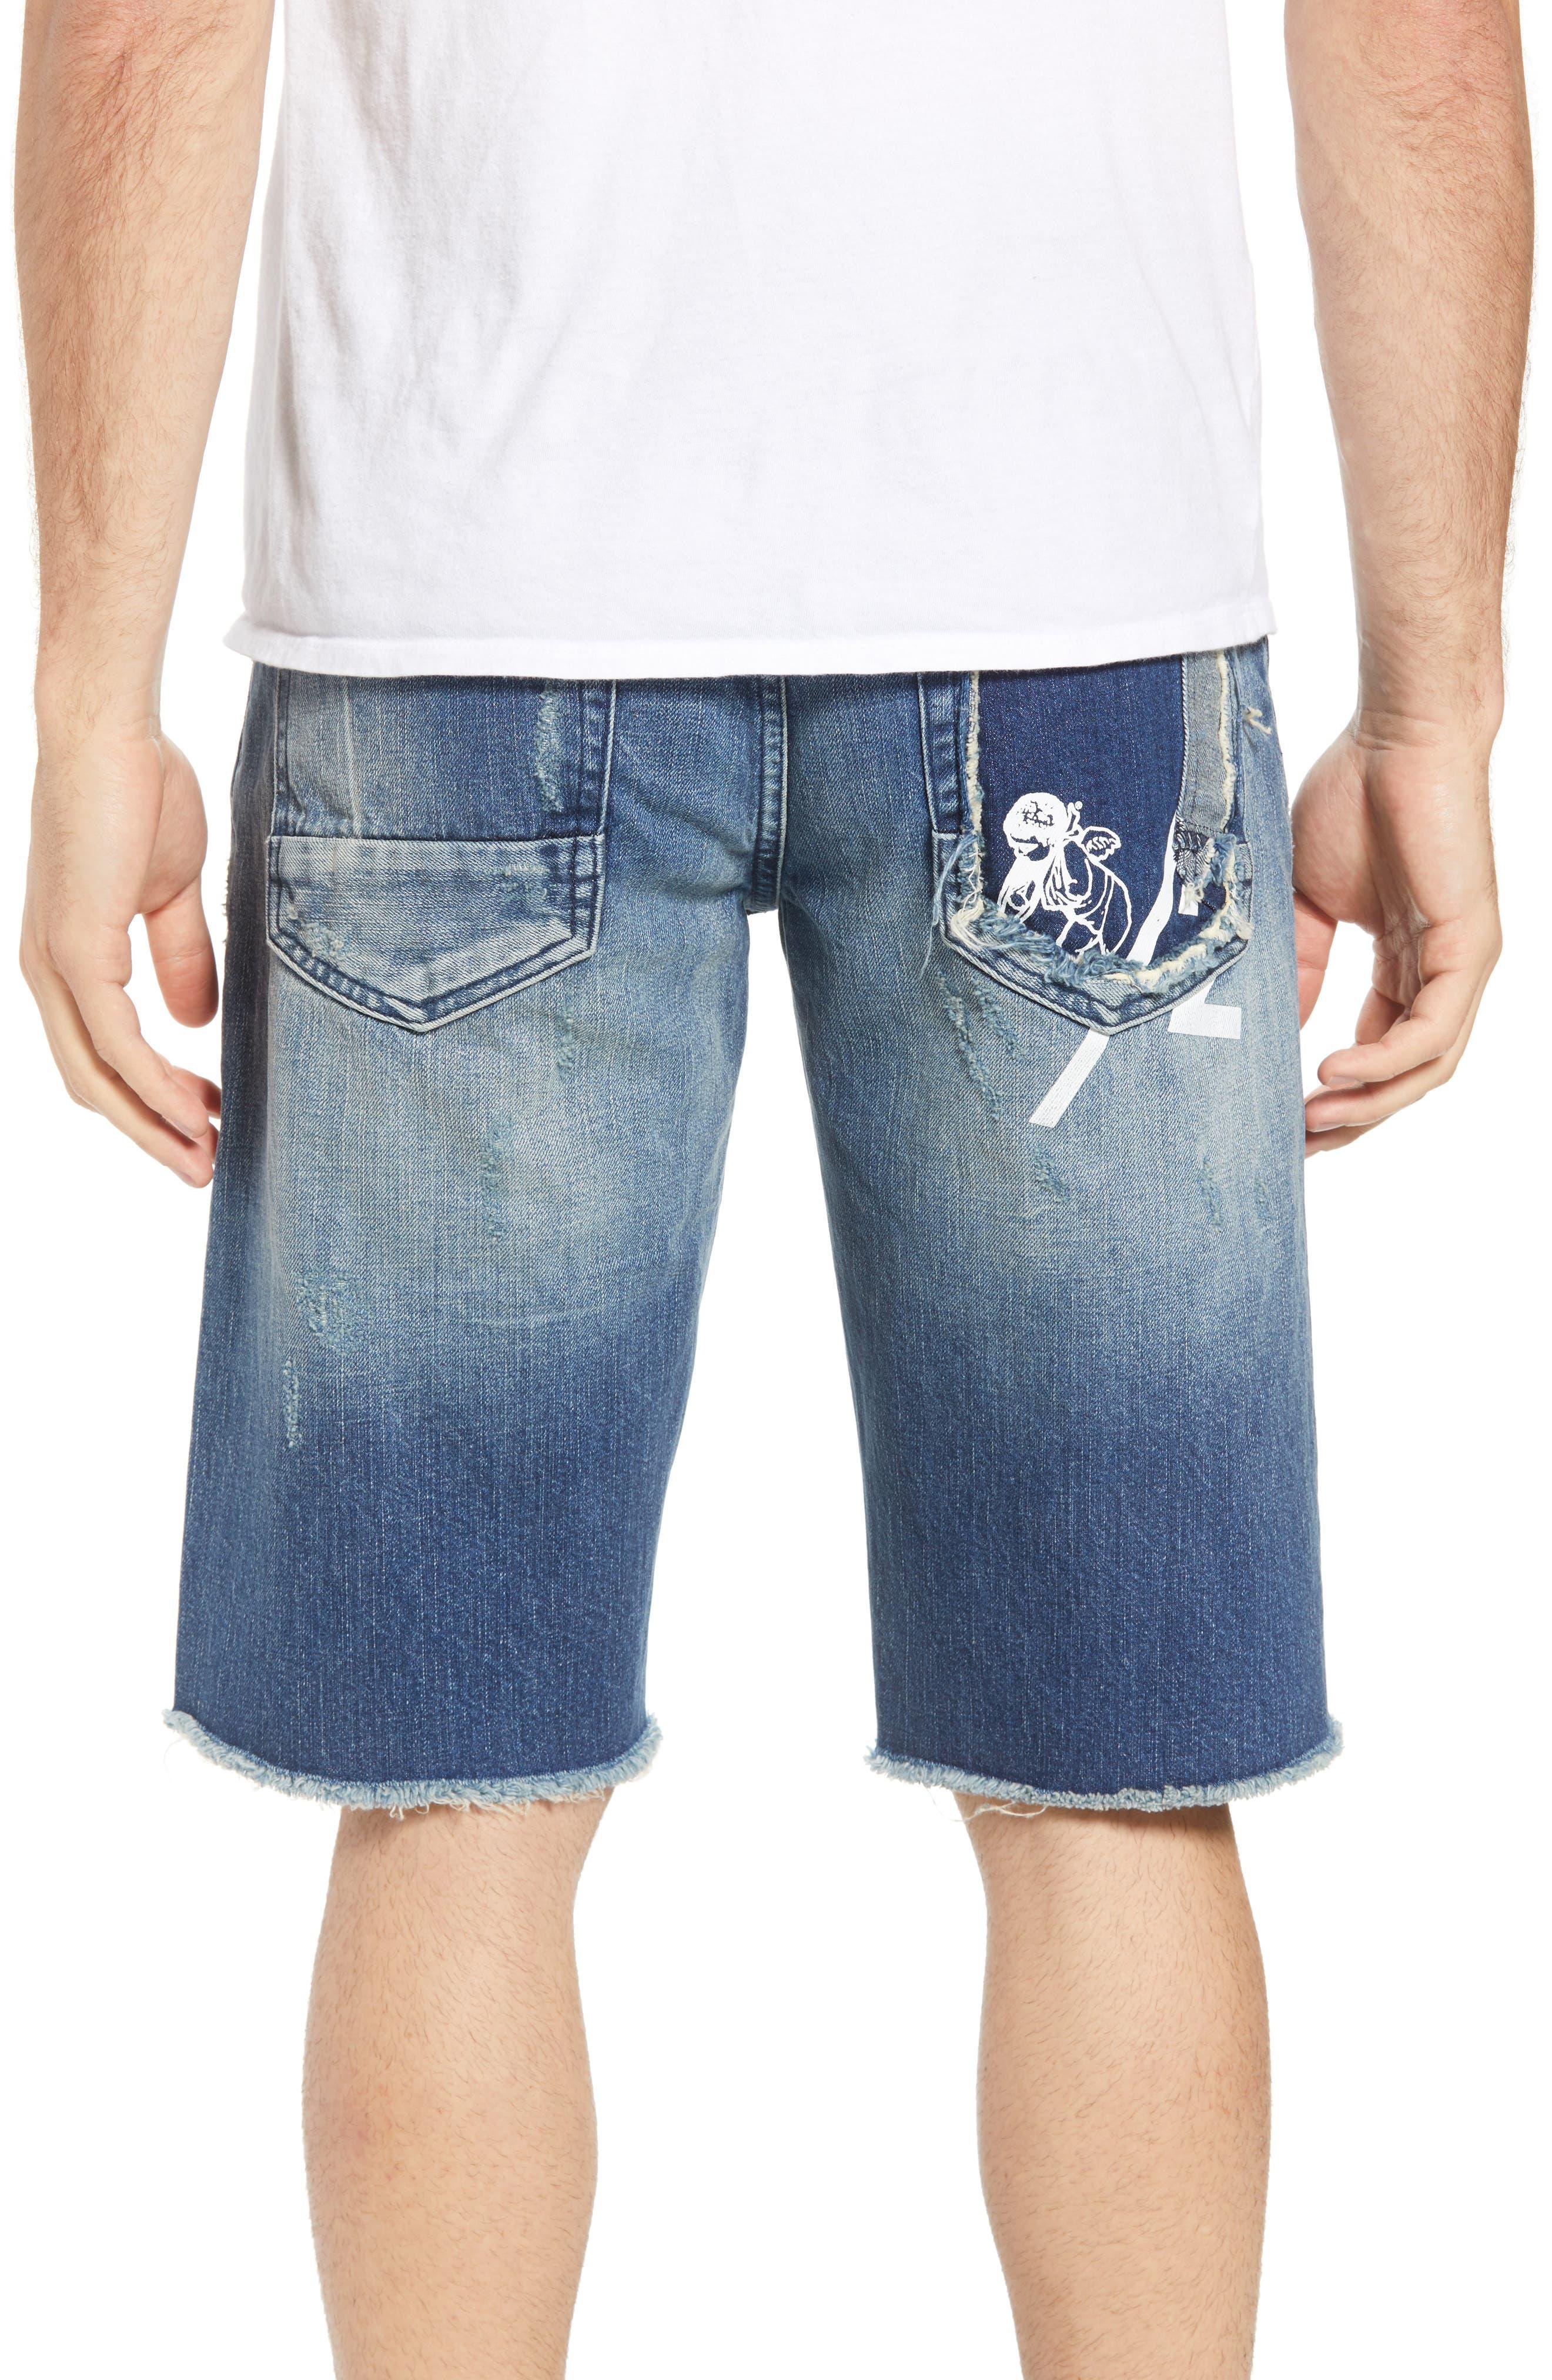 Challenger Regular Fit Shorts,                             Alternate thumbnail 2, color,                             WHISPERING